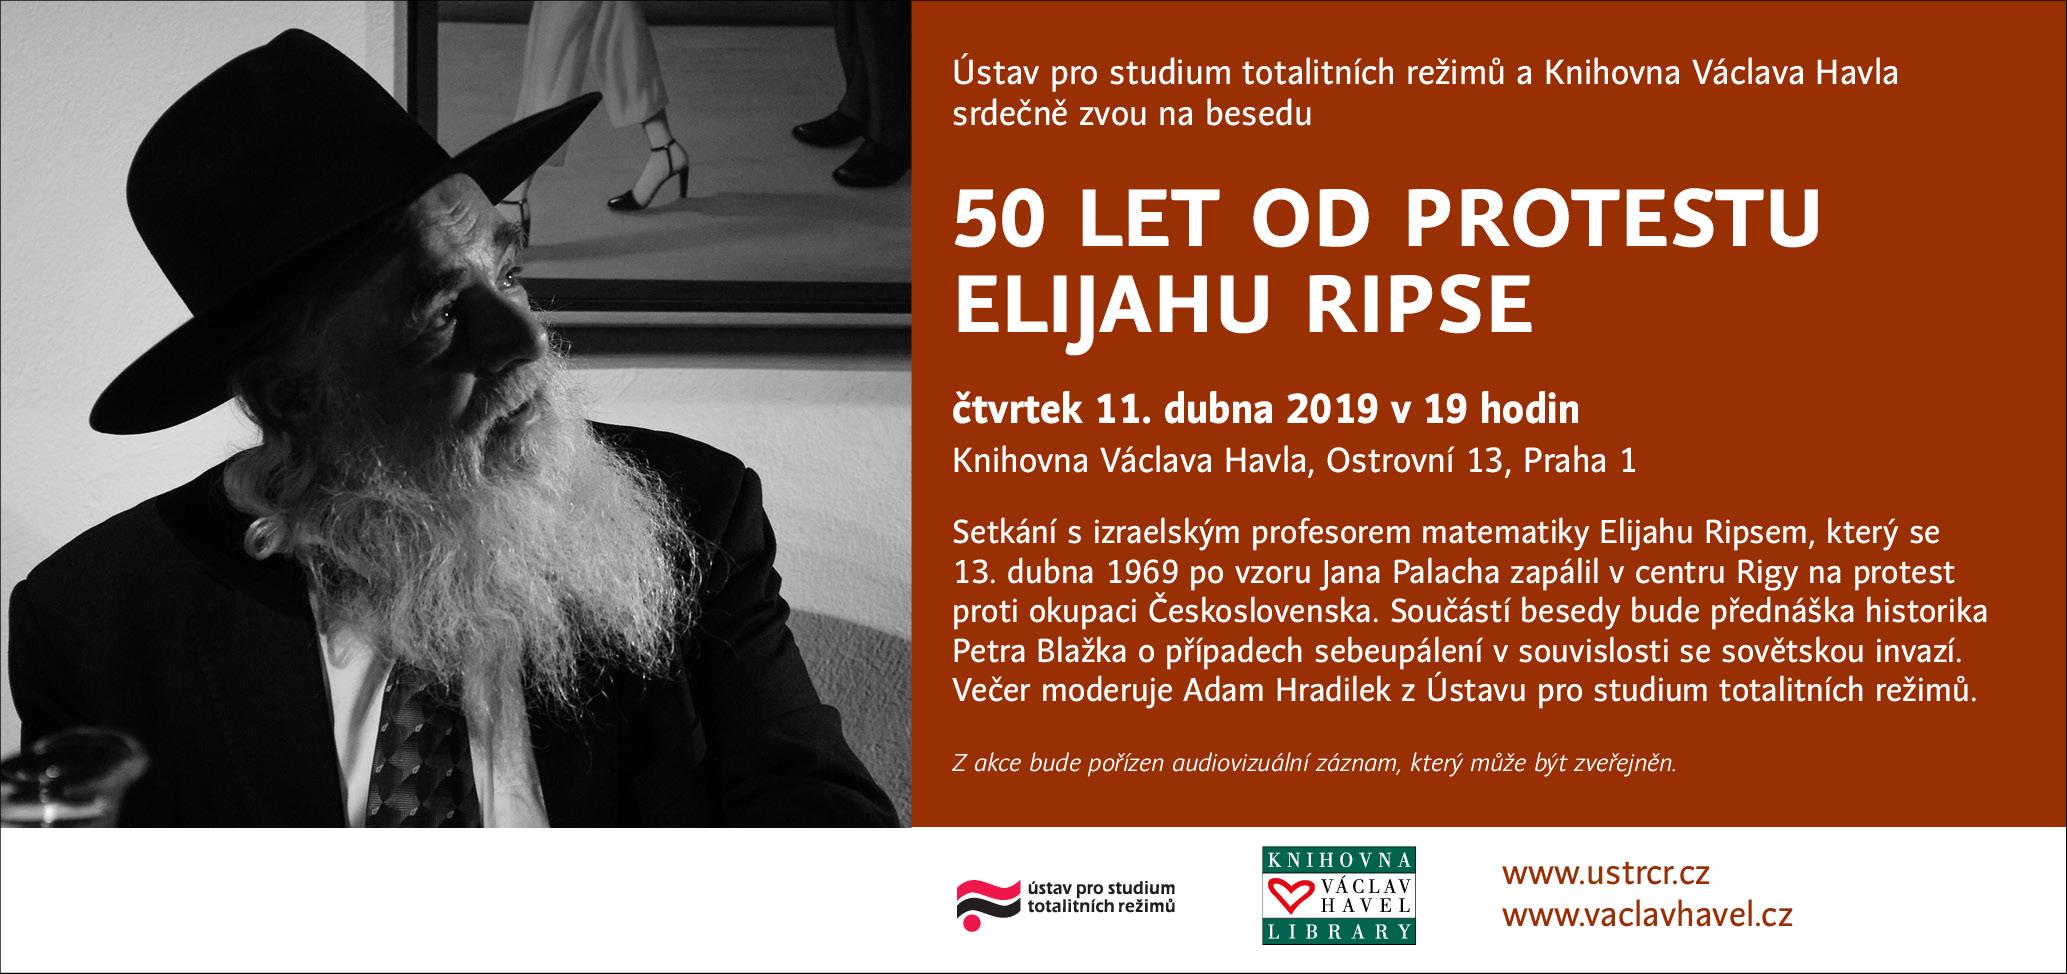 Pozvánka Eliahu Rips